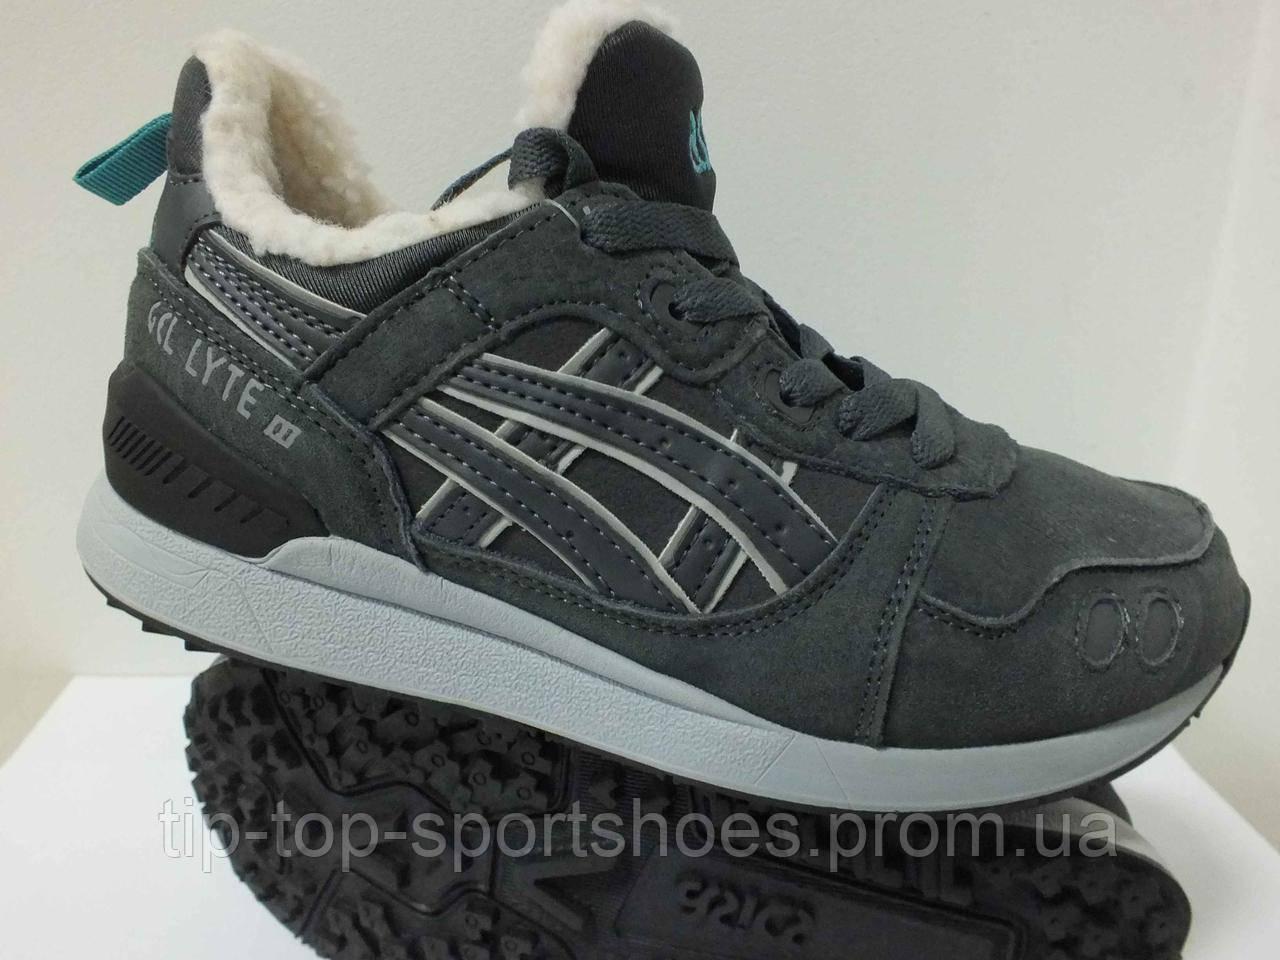 Зимняя обувь, зимние кроссовки мужские, зимові кросівки ASICS GEL LYTE размер 37, 38, 39 38, Серый